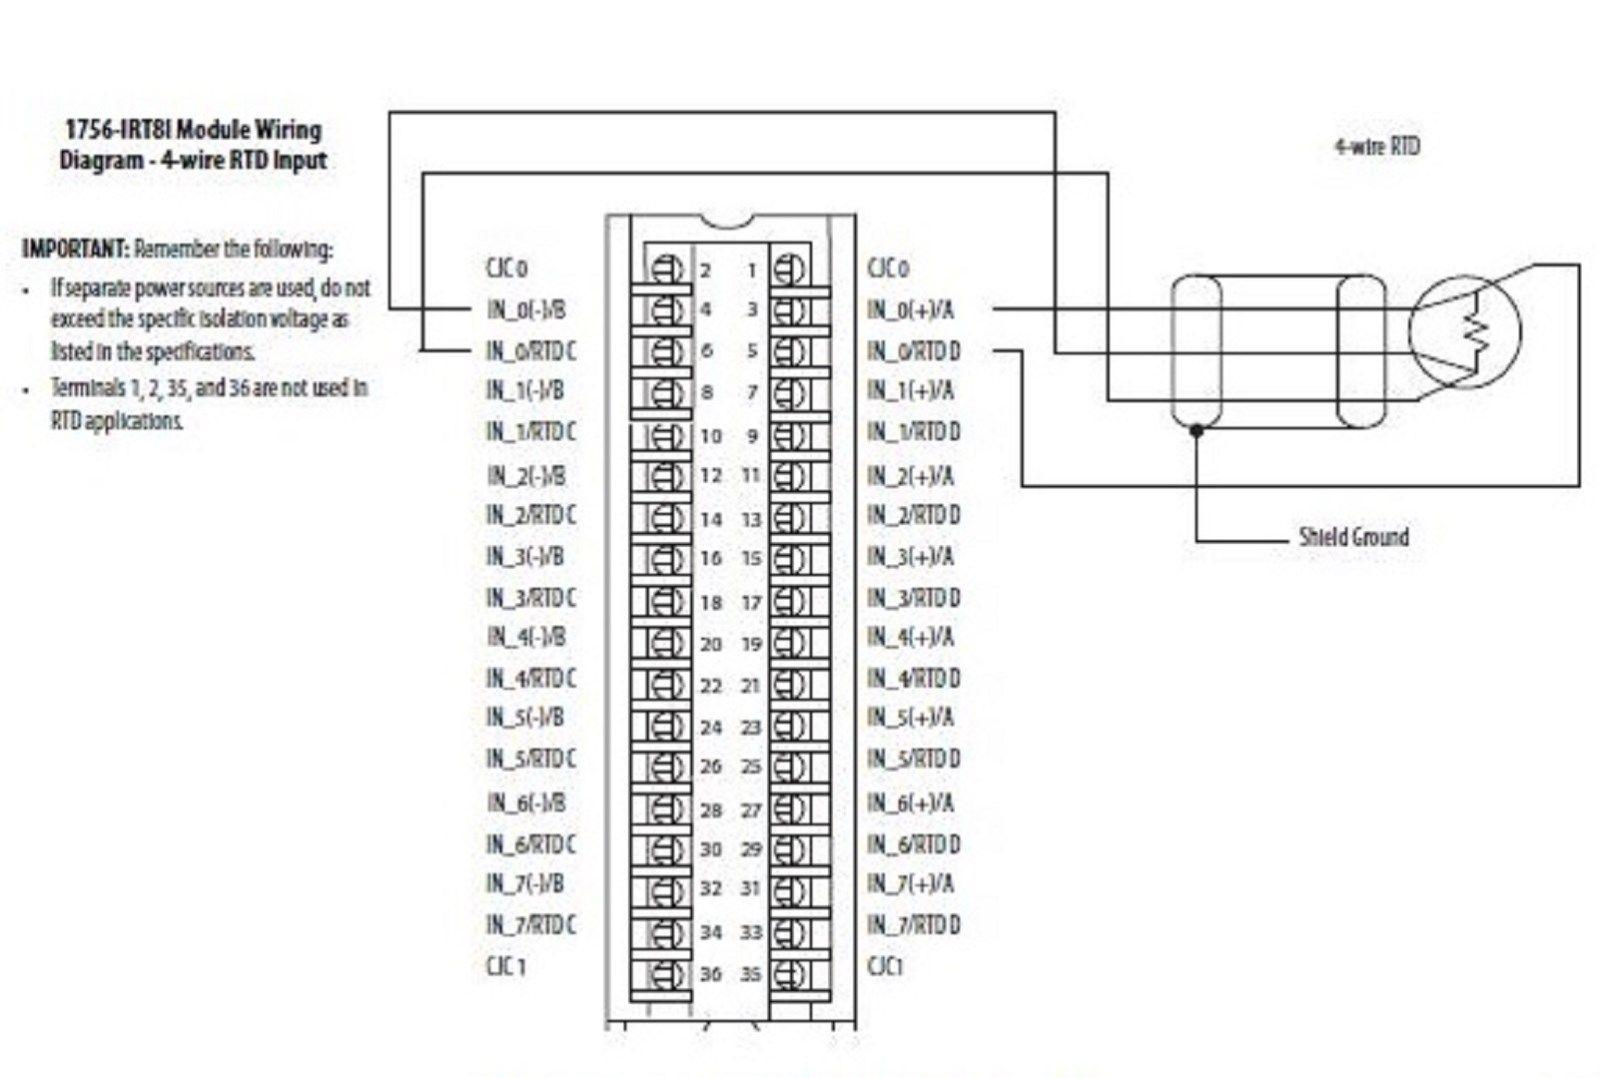 hight resolution of allen bradley 1794 ib16 wiring diagram collection 2017 new sealed allen bradley 1756 irt8i 1rt81